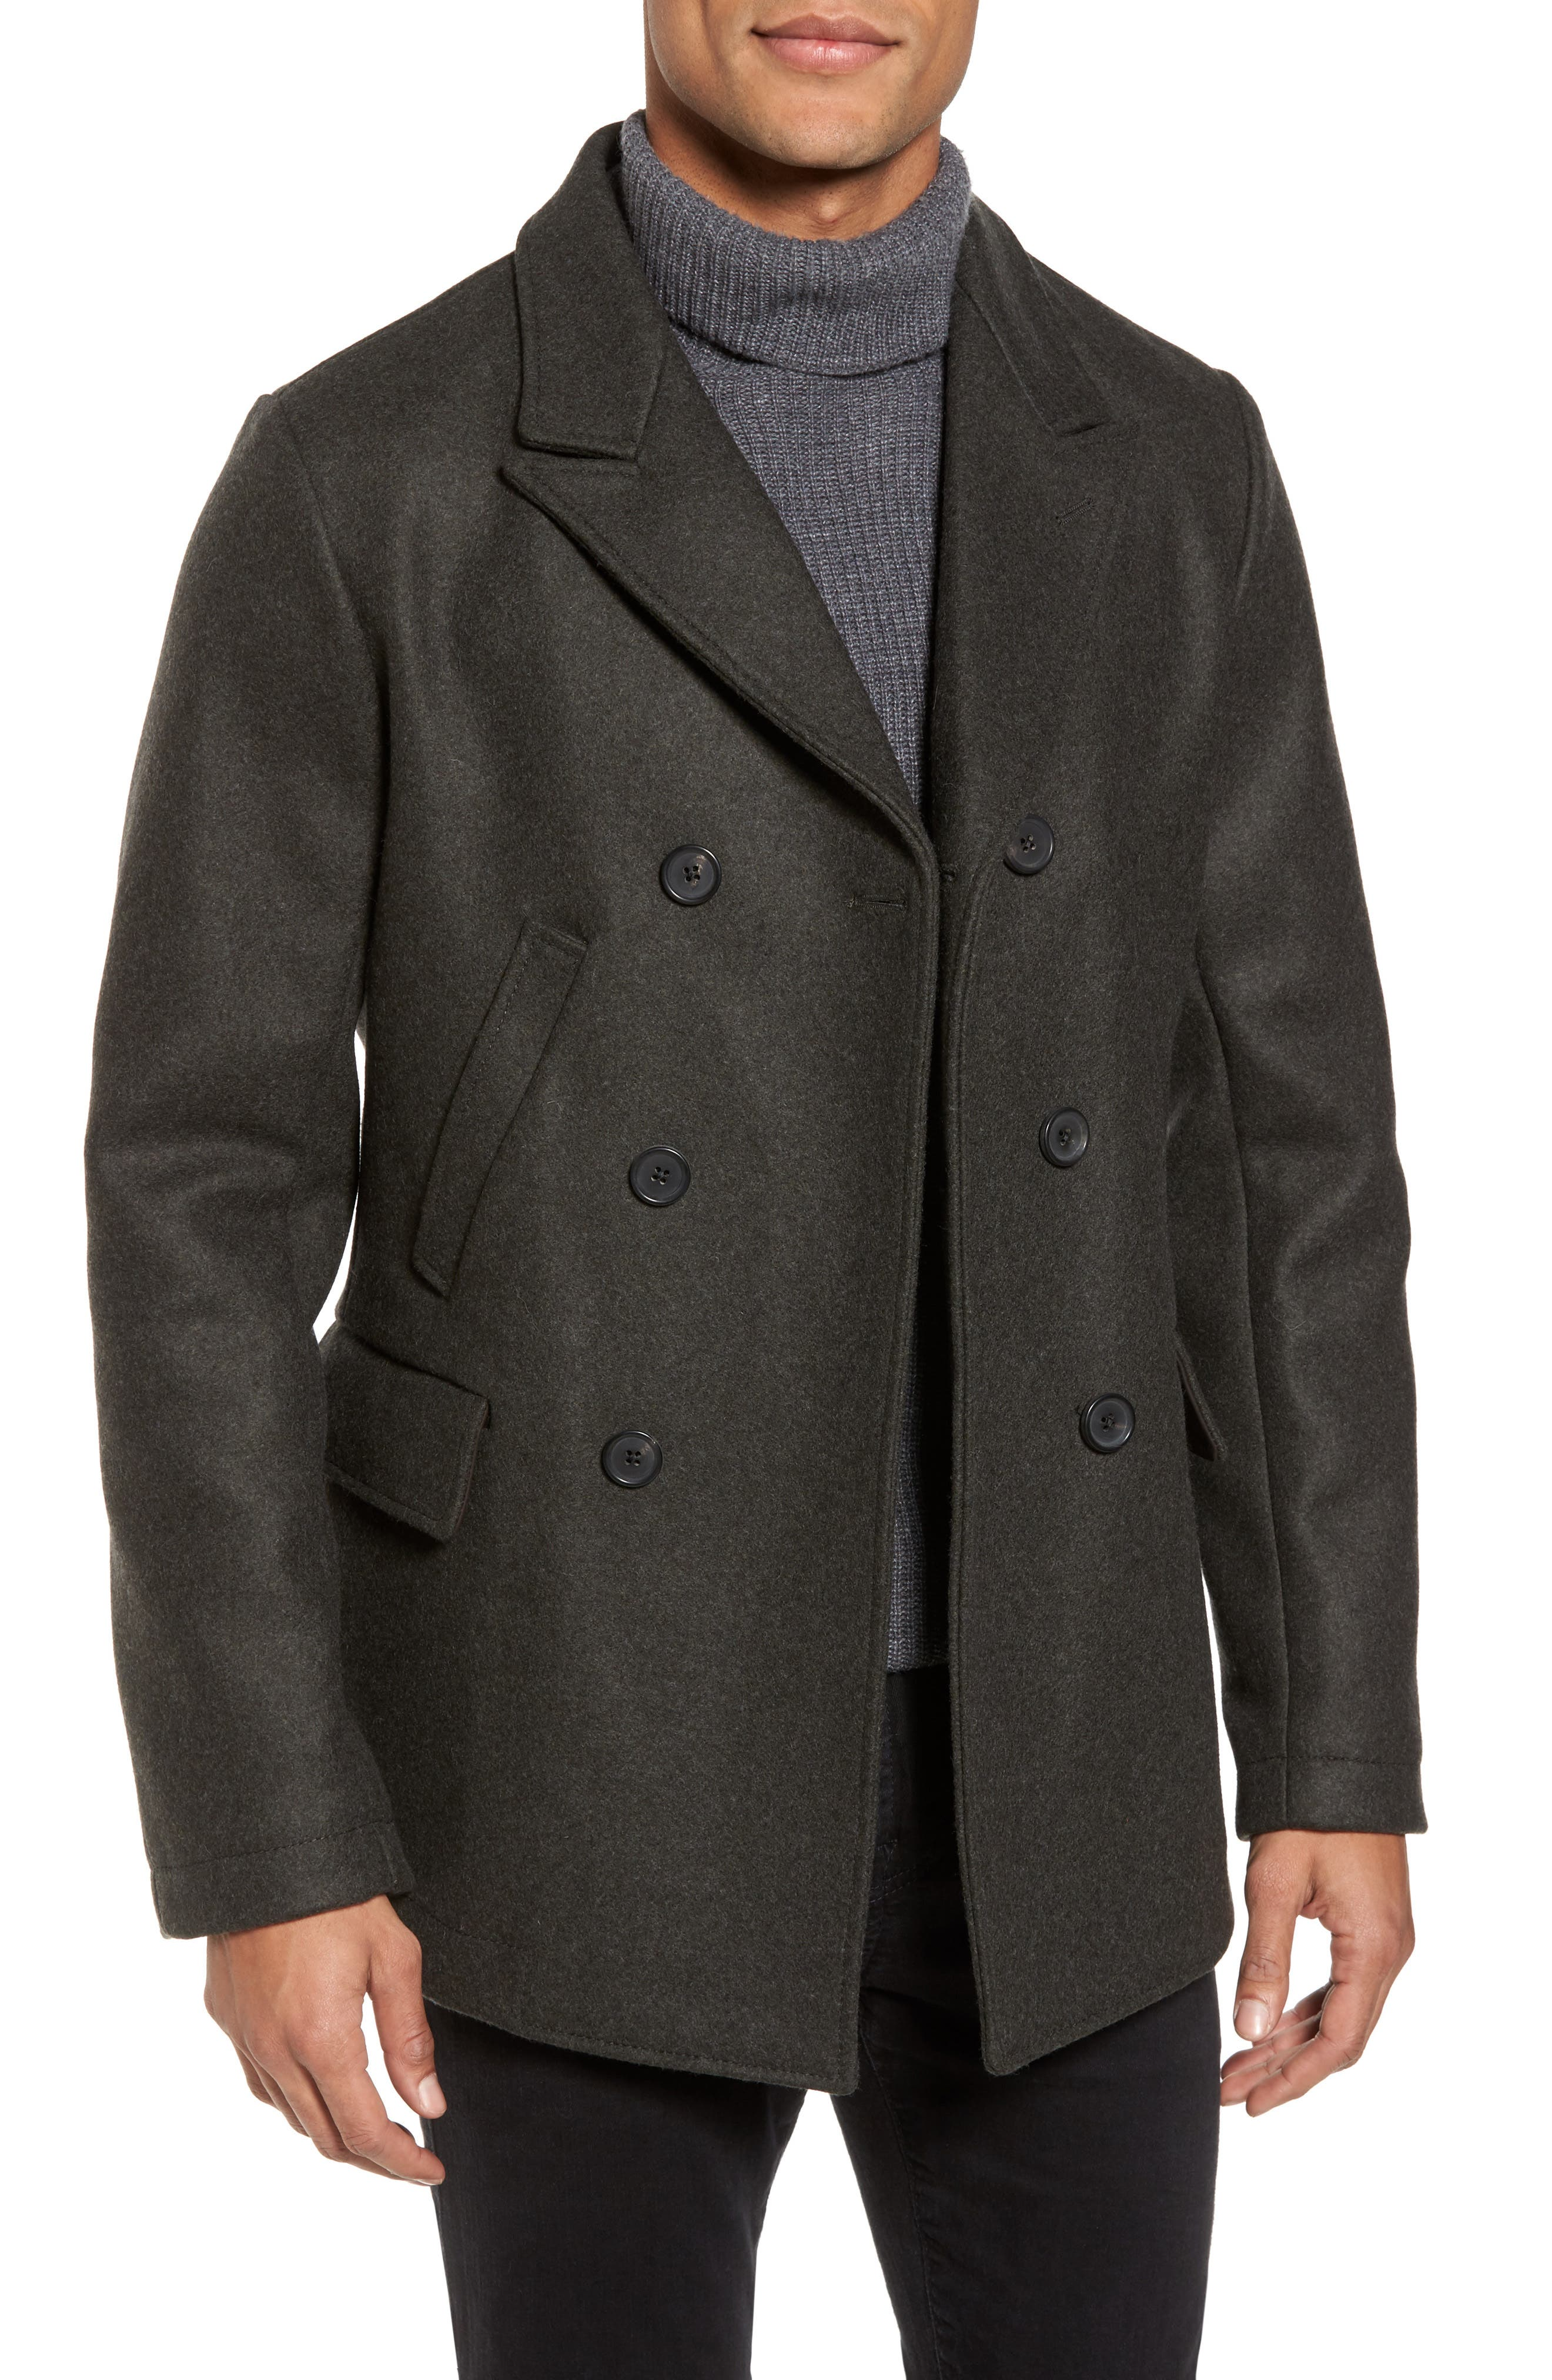 Main Image - Billy Reid 'Bond' Wool Blend Peacoat